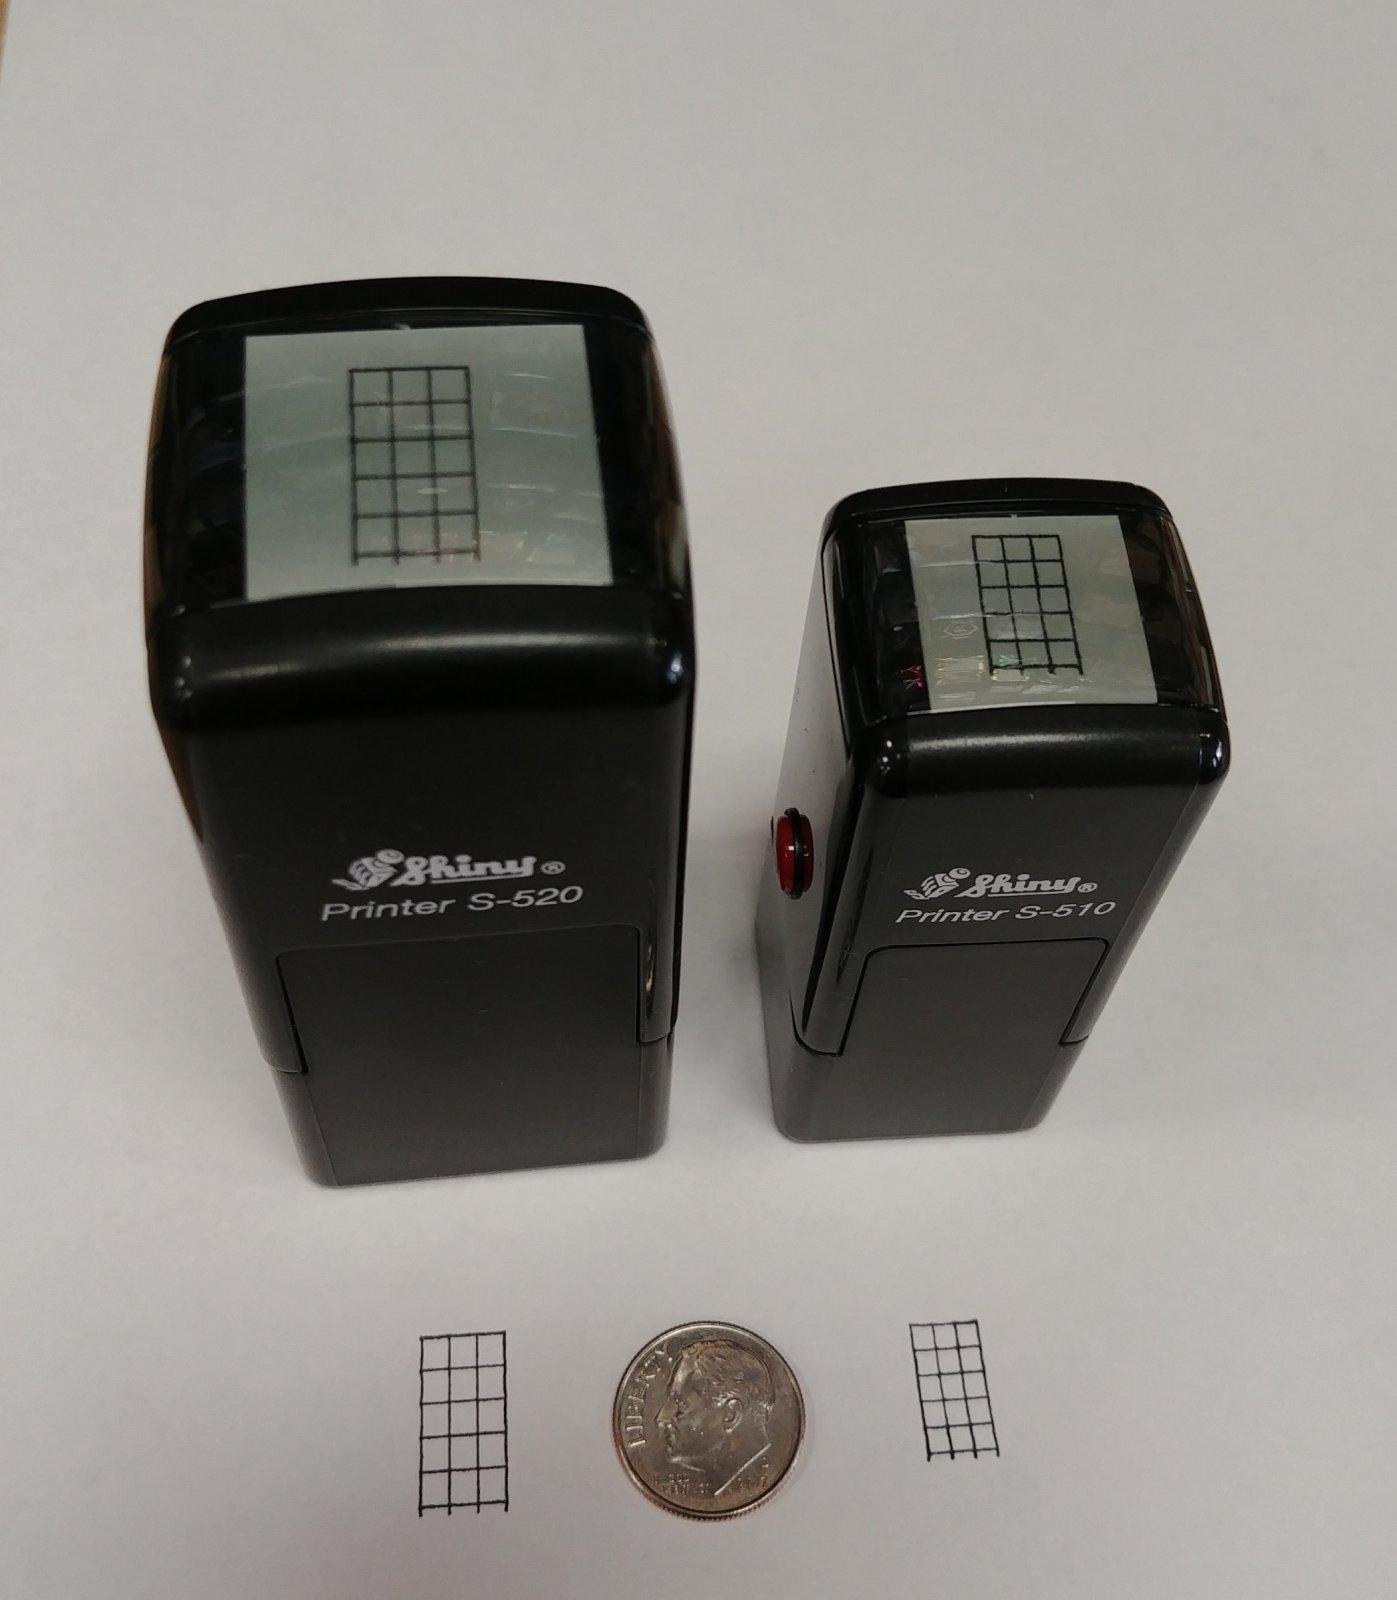 Aeromark Small 4-String Self-Inking Fret Stamp